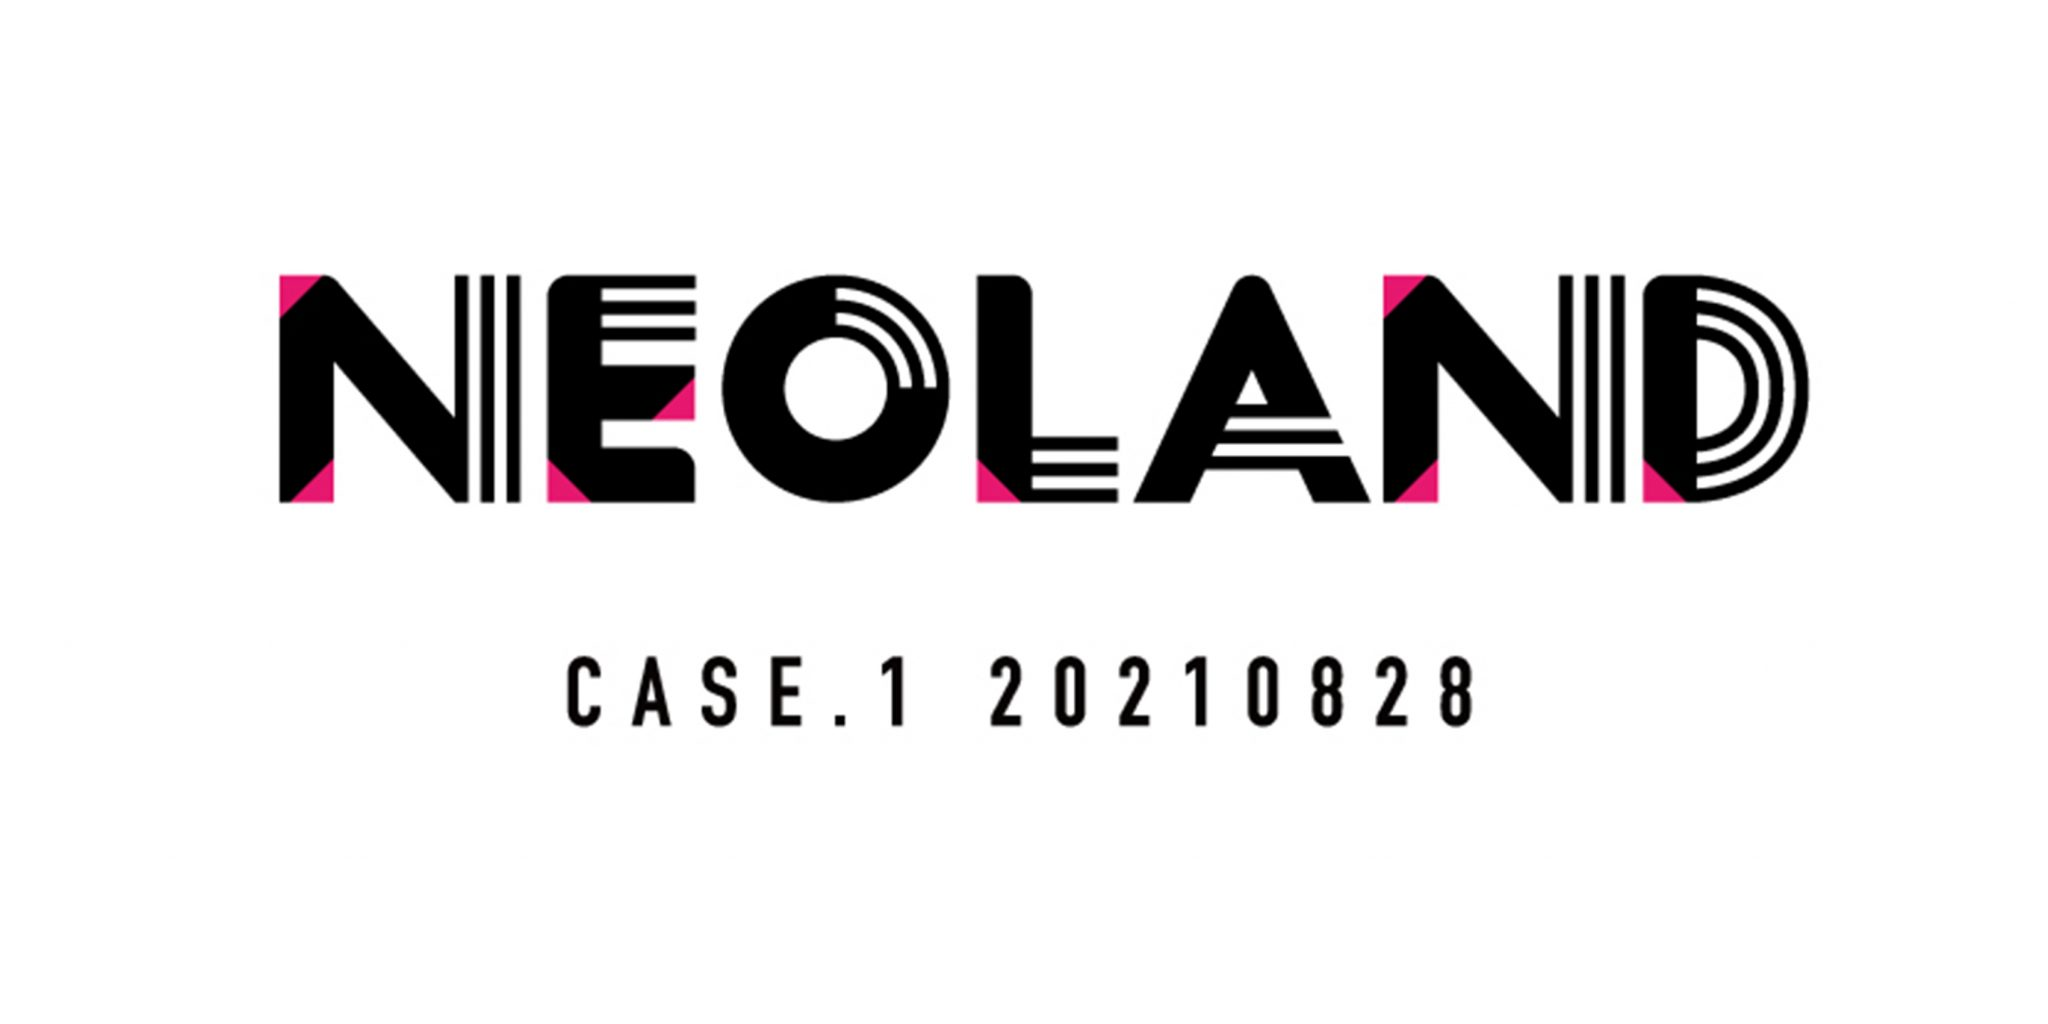 NEOLAND